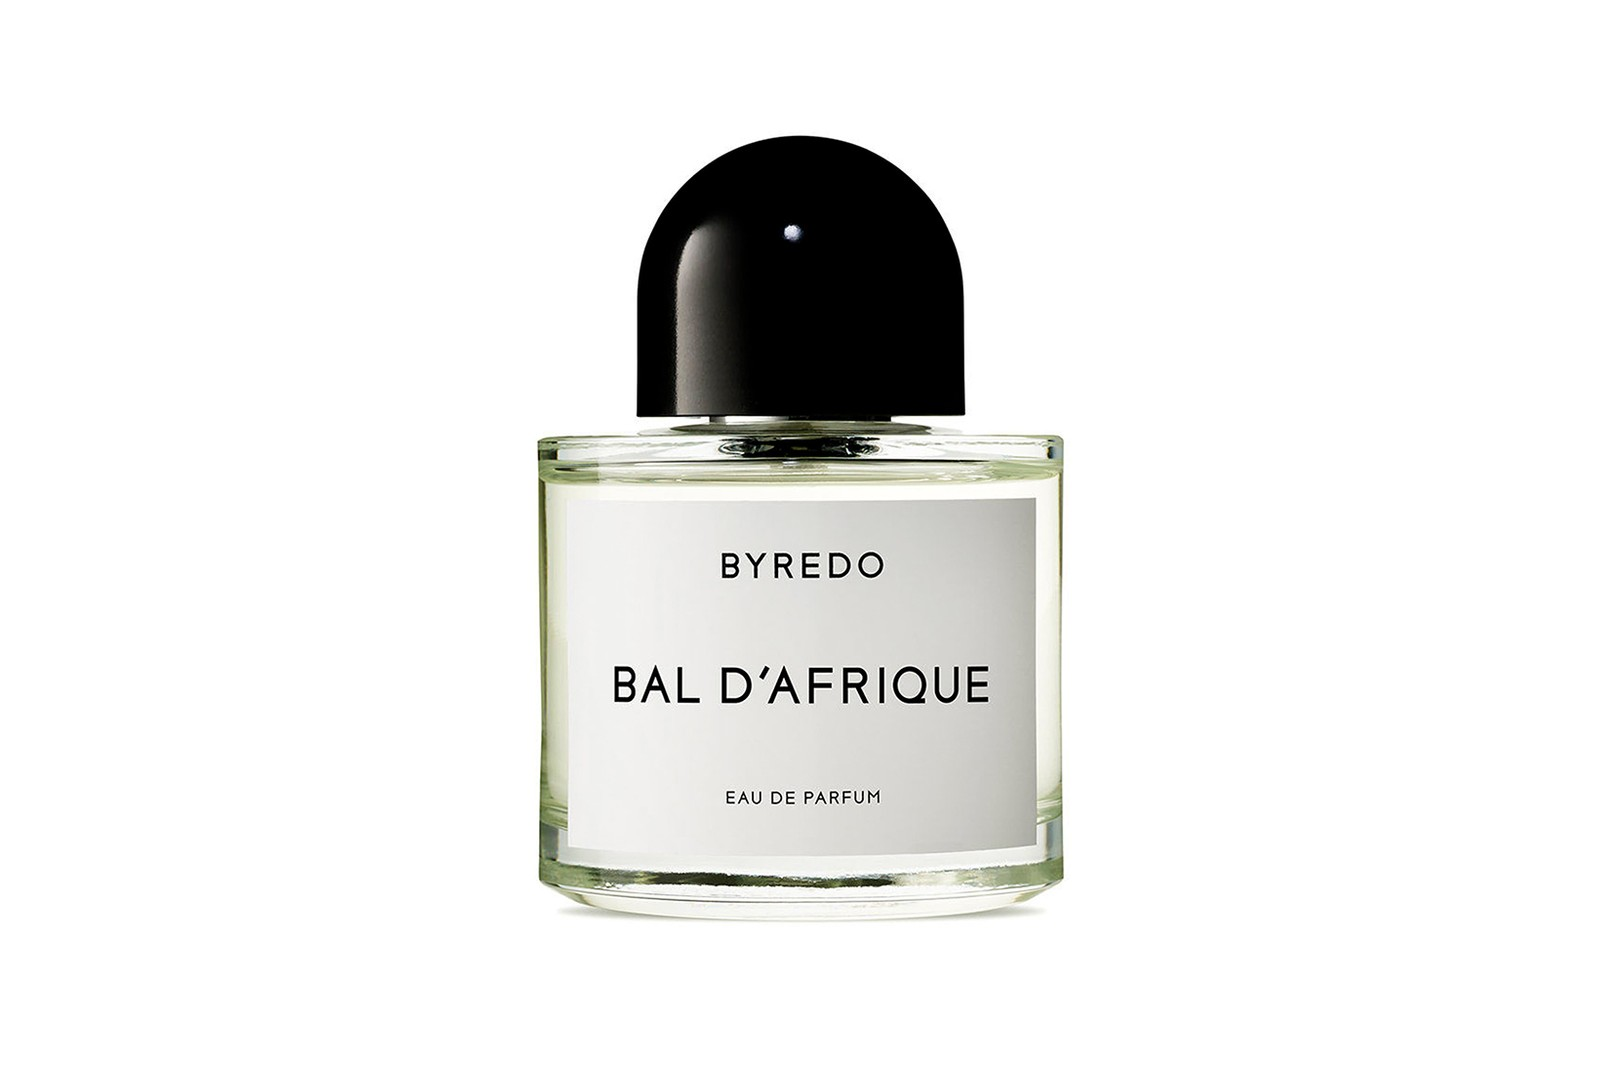 frangrances perfumes skin type chanel jo malone ysl yves saint laurent bottega veneta tom ford byredo